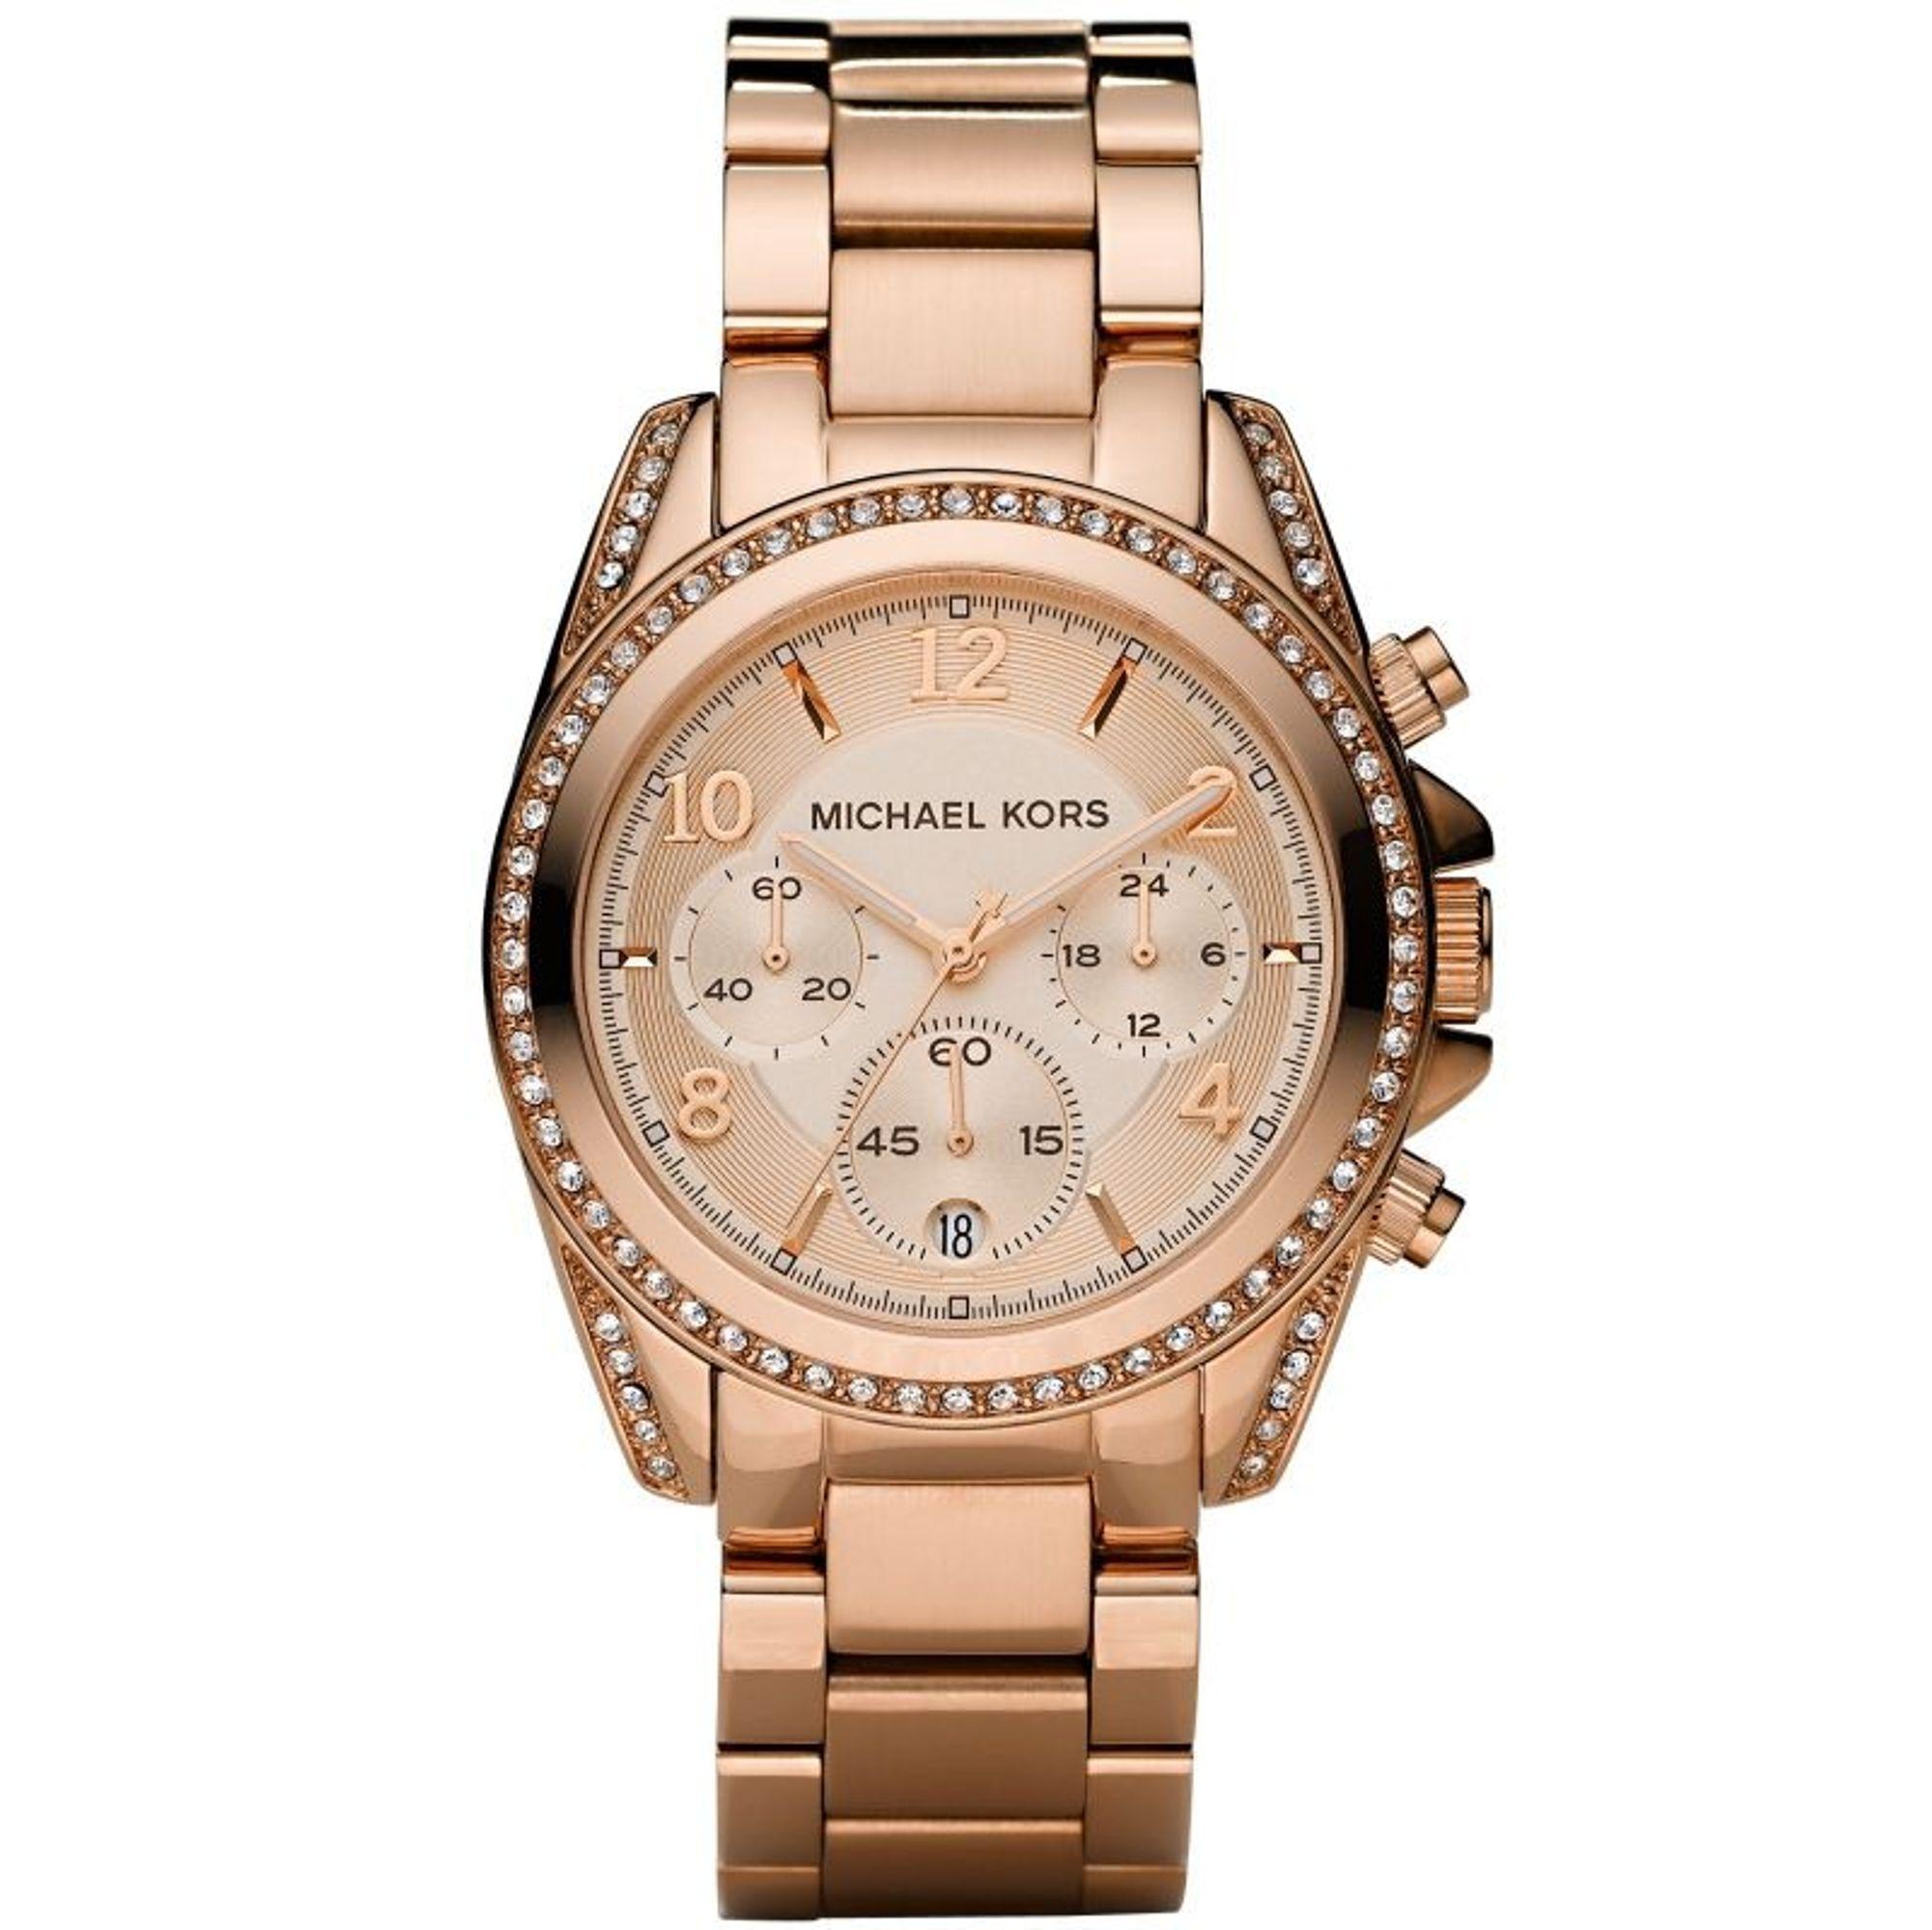 Michael Kors MK5263 BLAIR Chronograph Uhr Damenuhr Edelstahl rosé